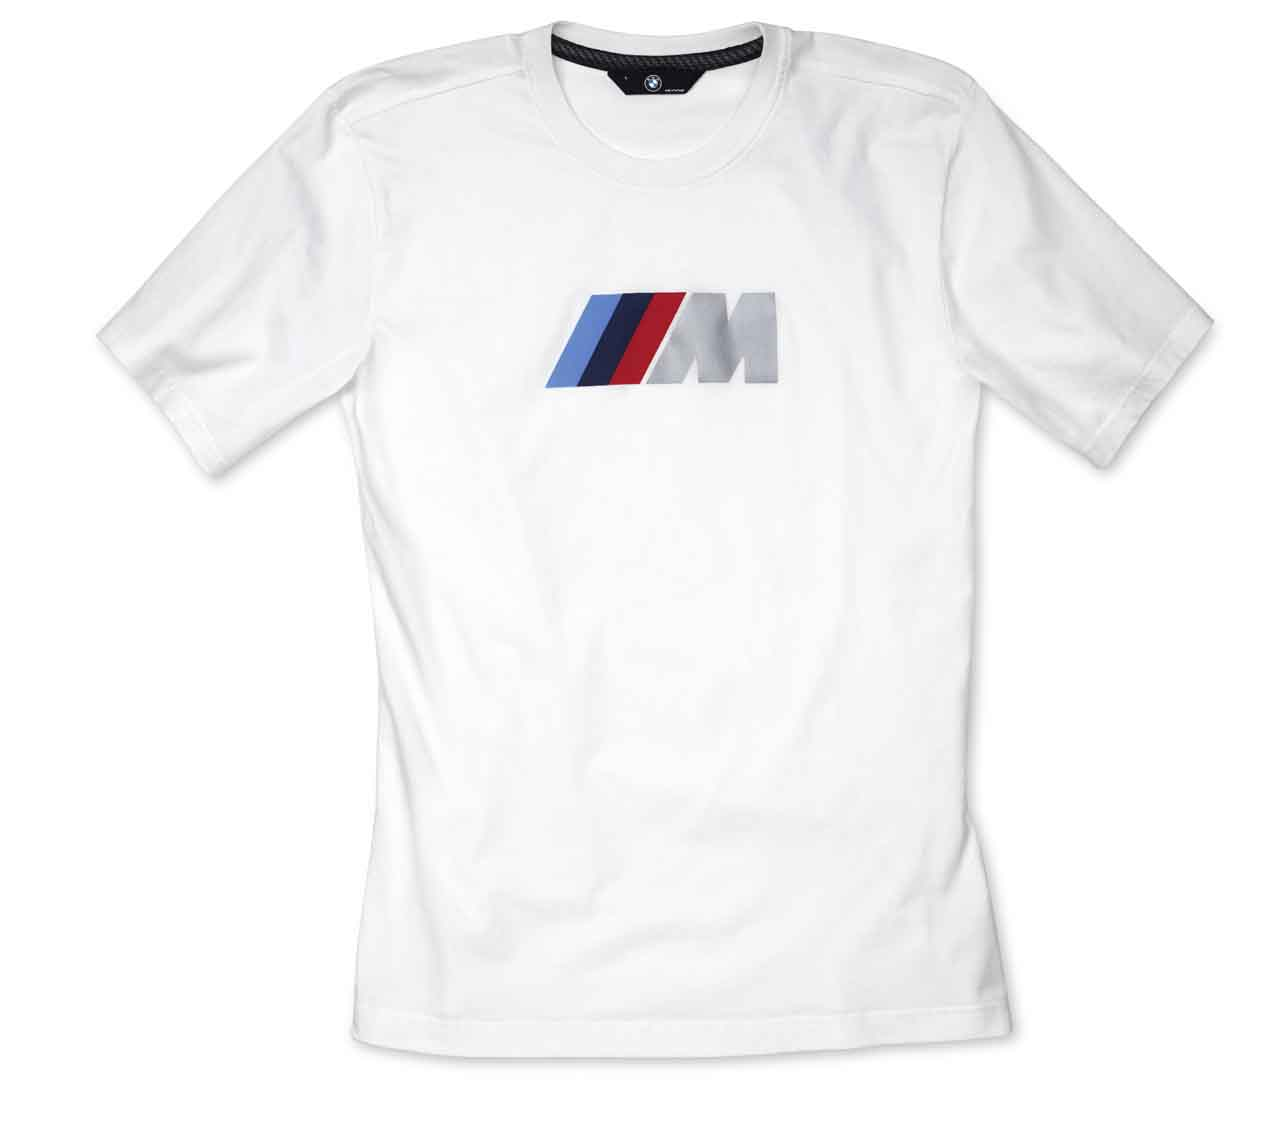 Bmw m herren fan t shirt bmw boomers online shop for Bmw t shirt online